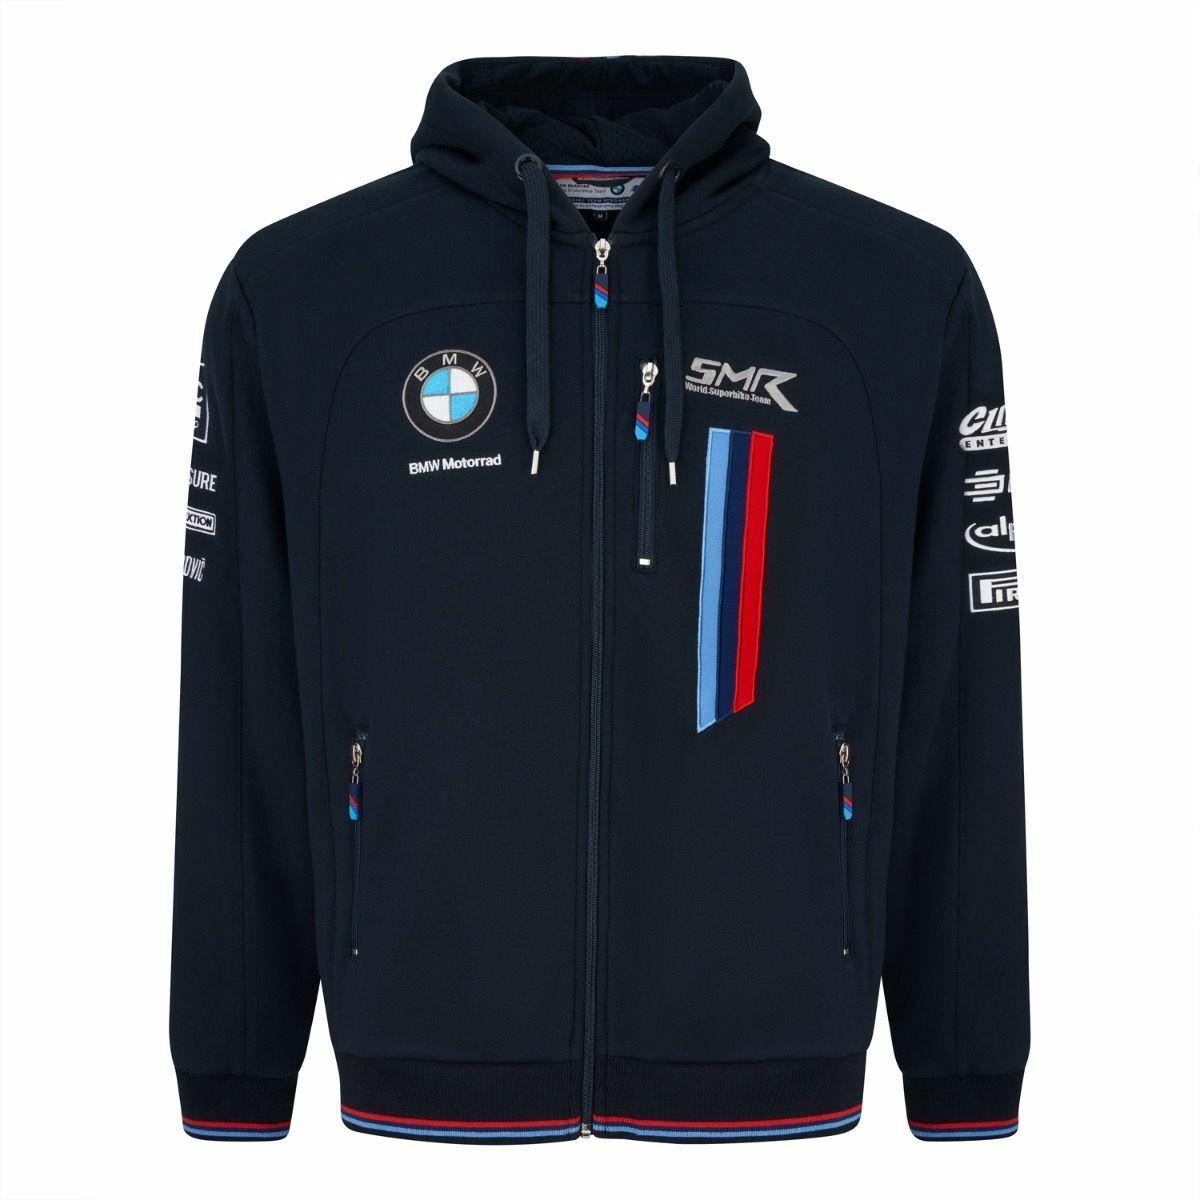 BMW Motorrad World Superbike Team Hoodie NEW Superbike Apparel